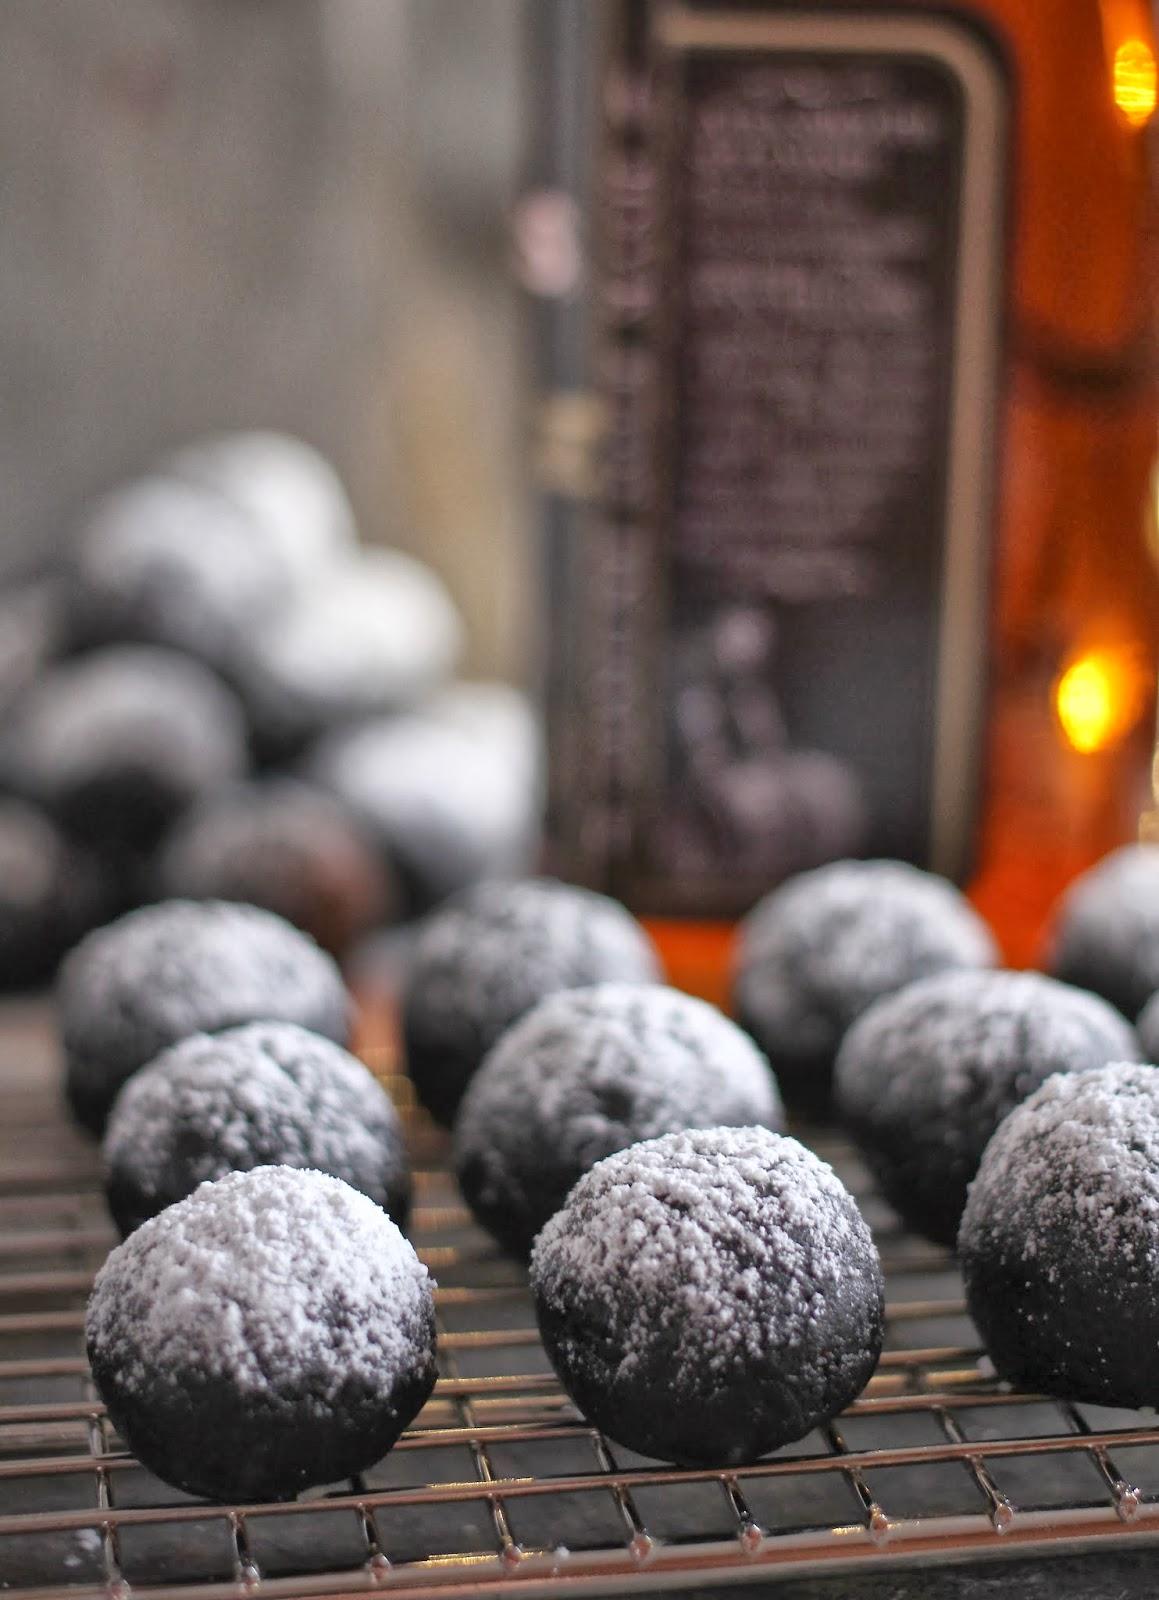 Arctic Garden Studio: Double Chocolate Bourbon Balls